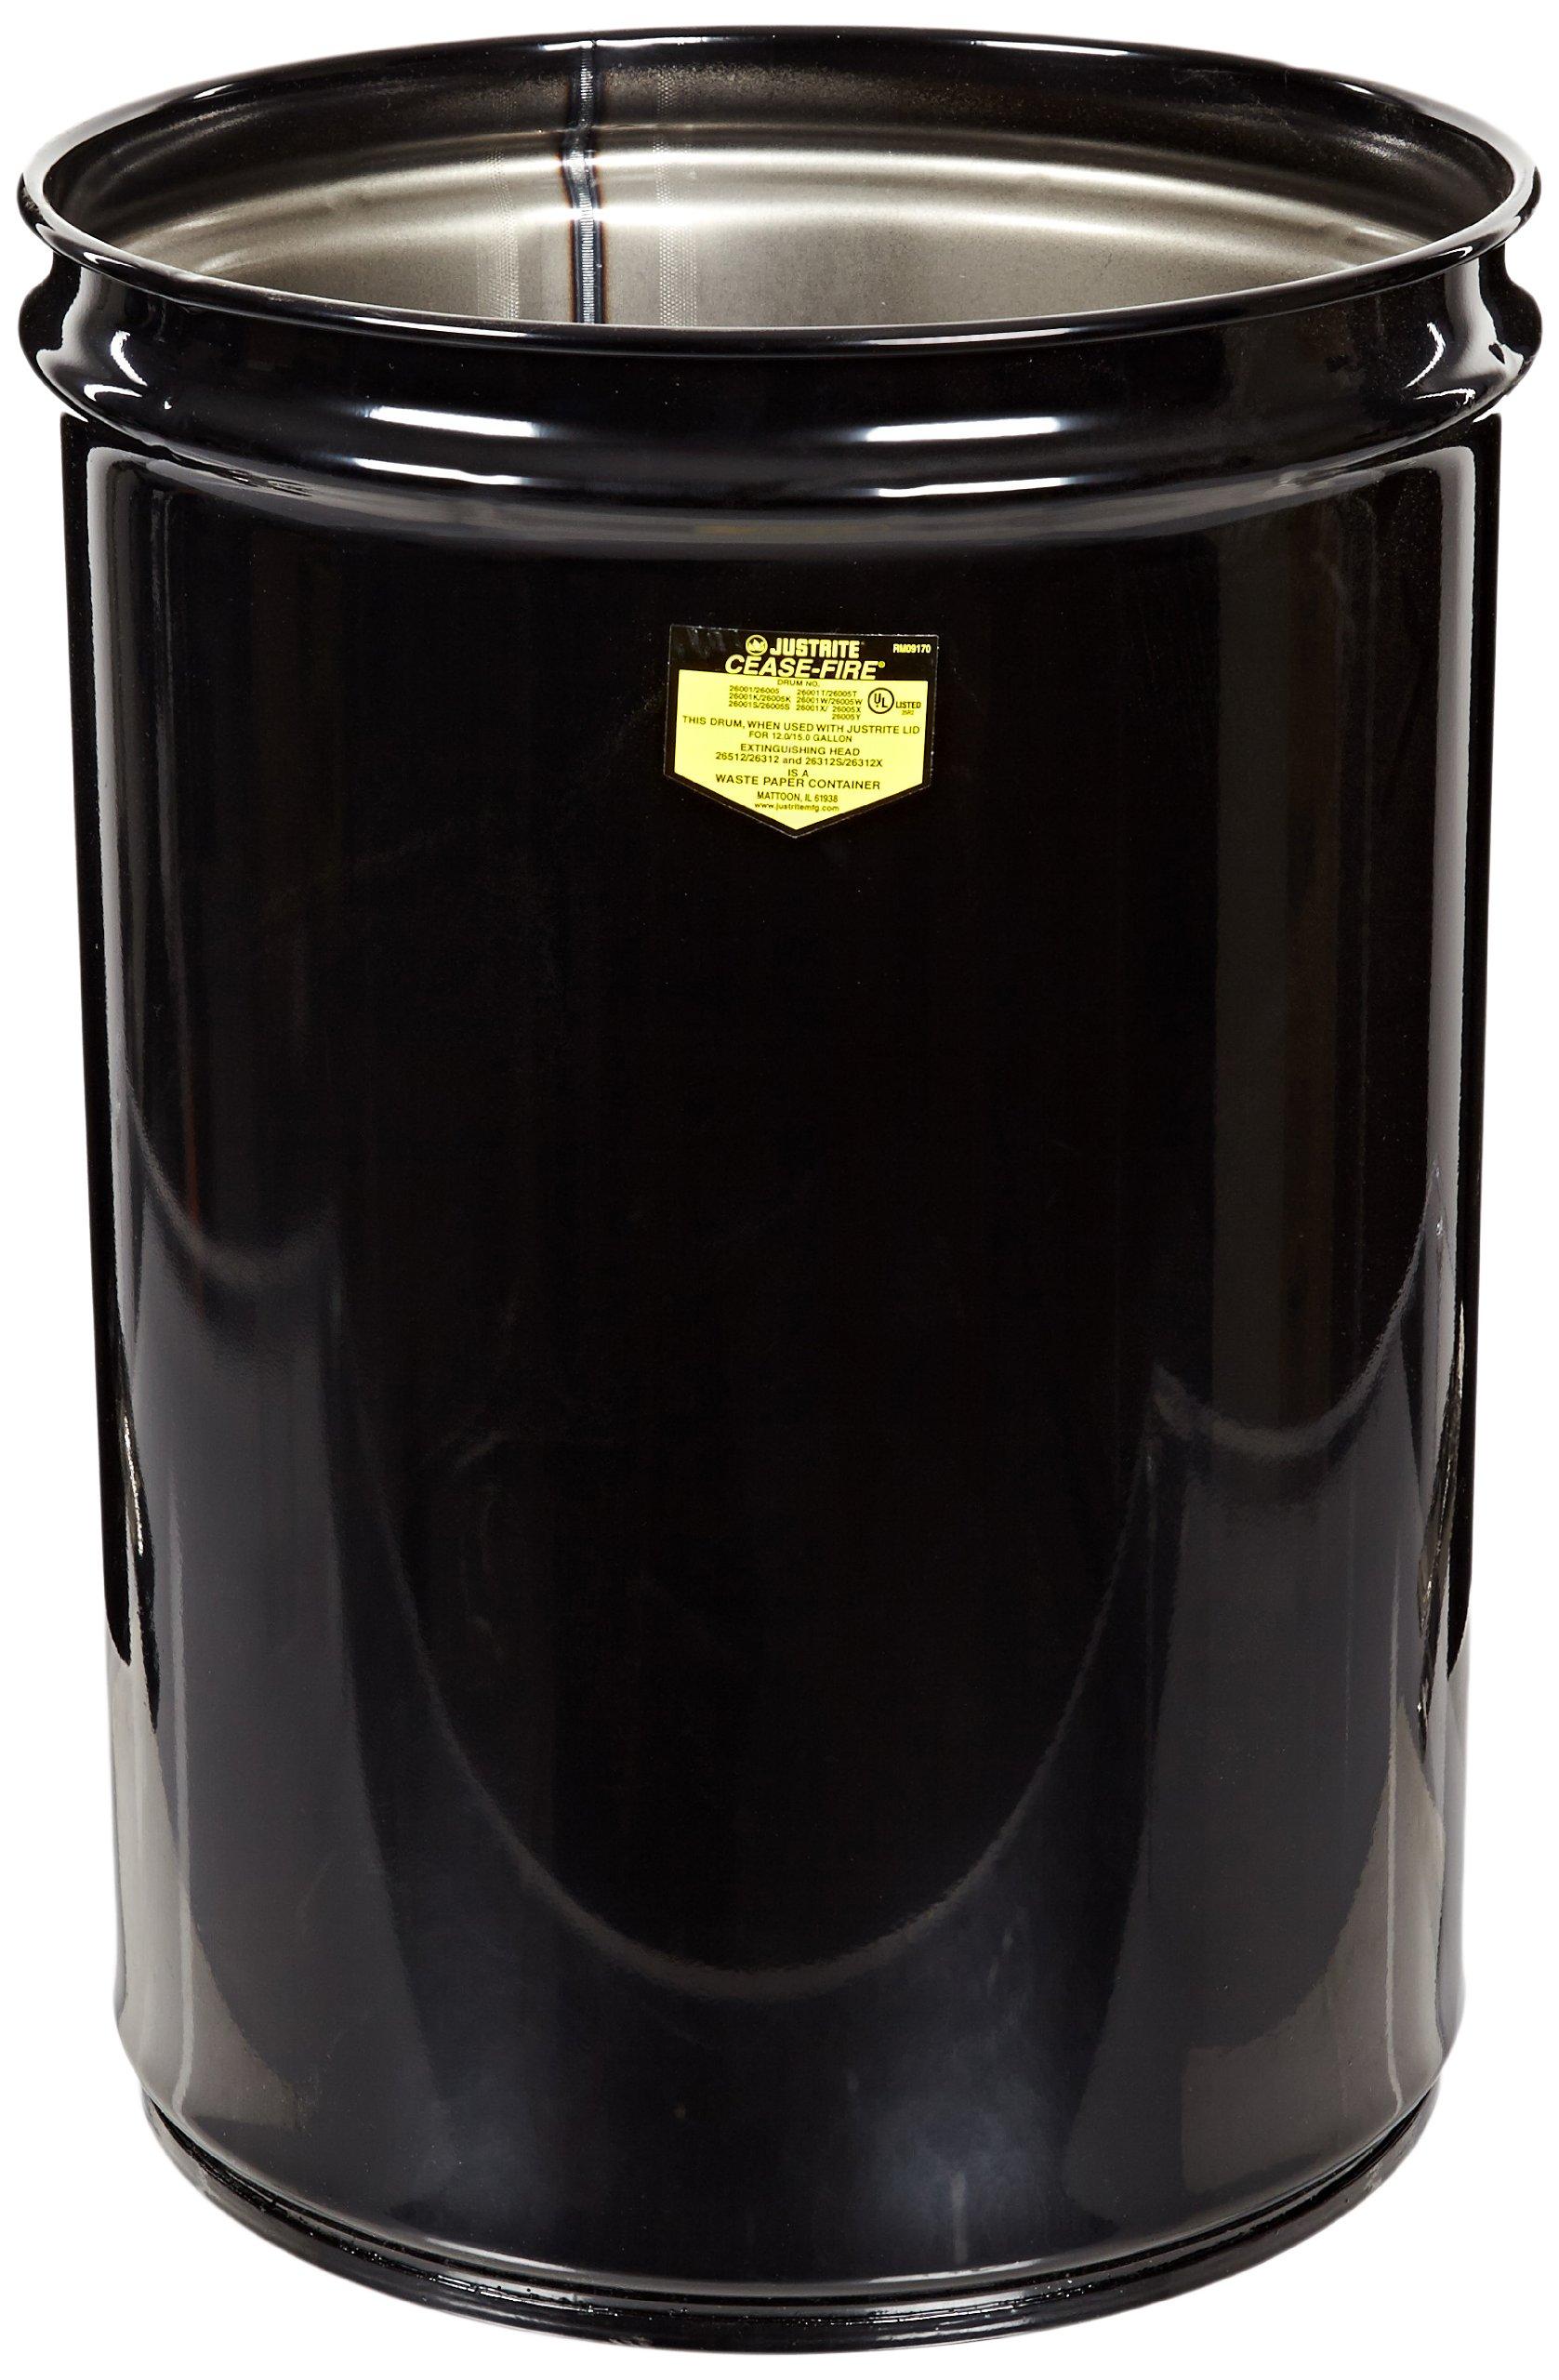 "Justrite 26001K Cease-Fire Steel Drum, 12 Gallon Capacity, 14-1/2"" OD x 20-1/4"" Height, Black"